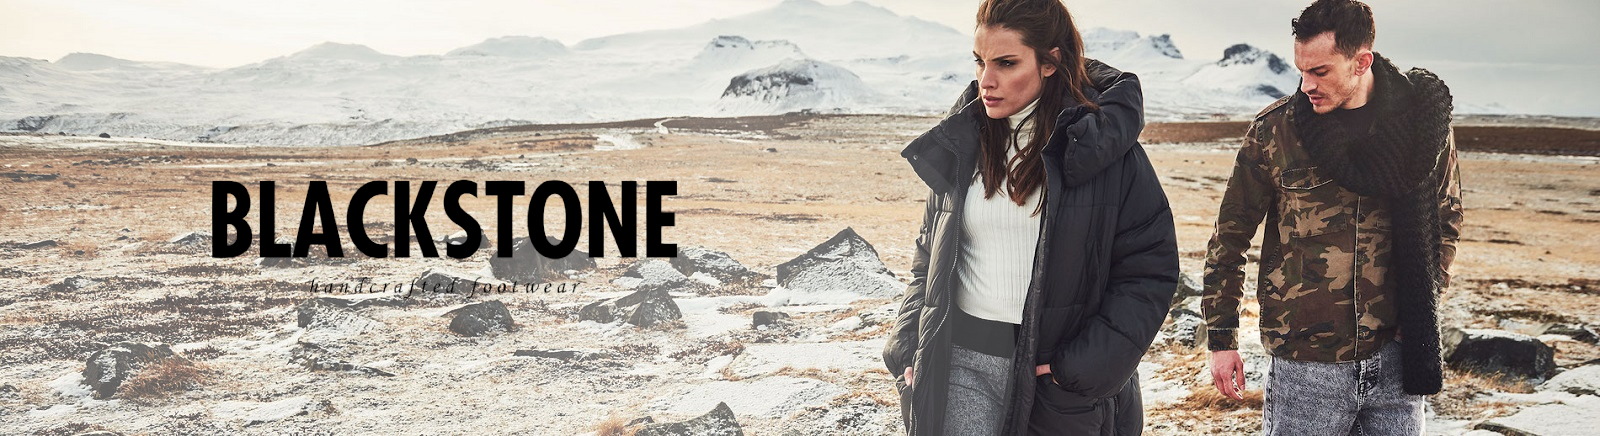 Juppen: Blackstone Combat Boots für Damen online shoppen